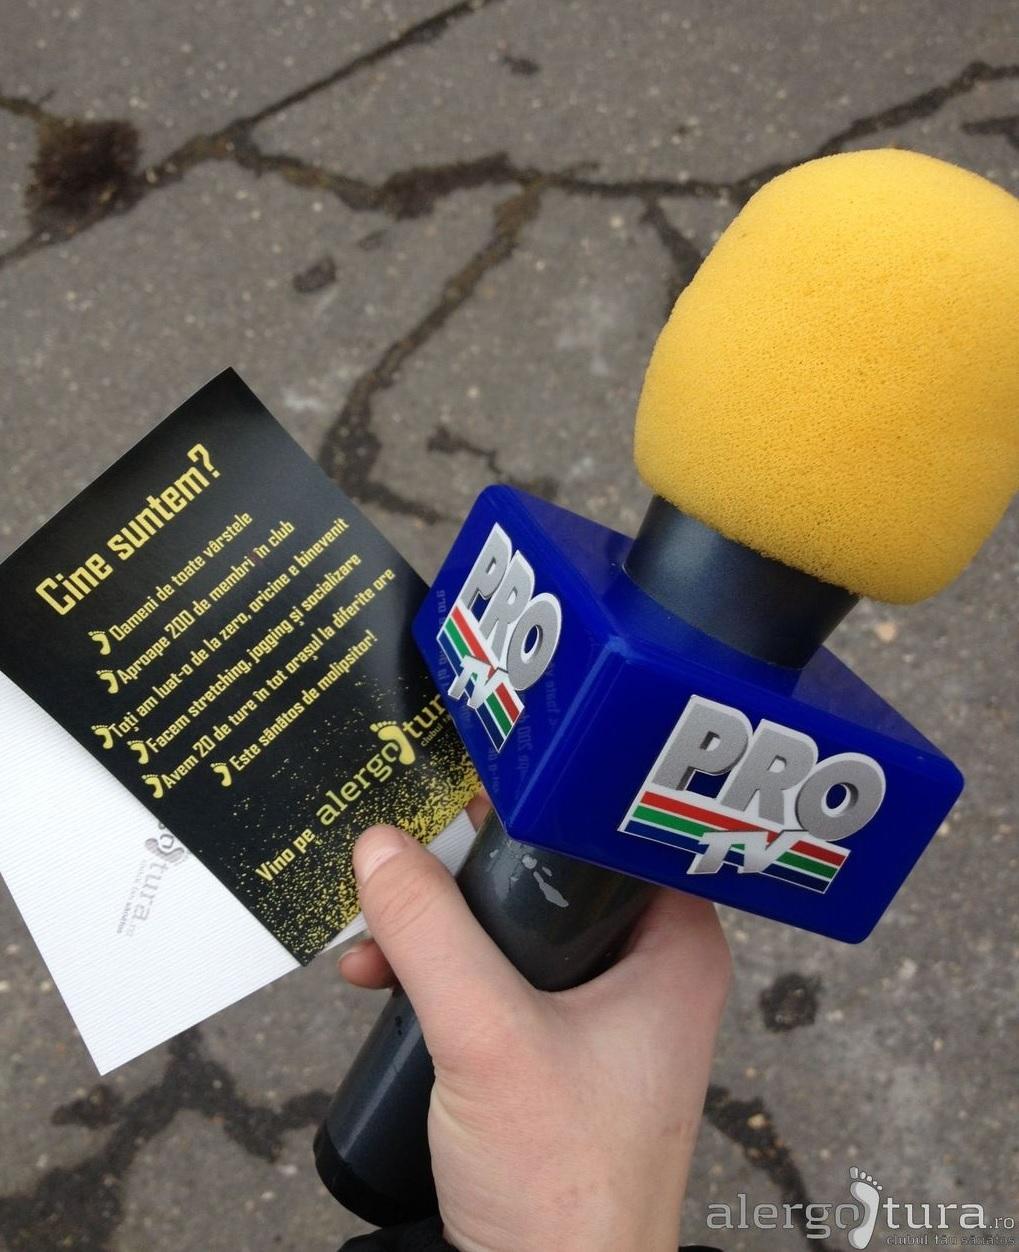 Stirile nationale ProTV de ora 19:00, din nou, despre Alergotura